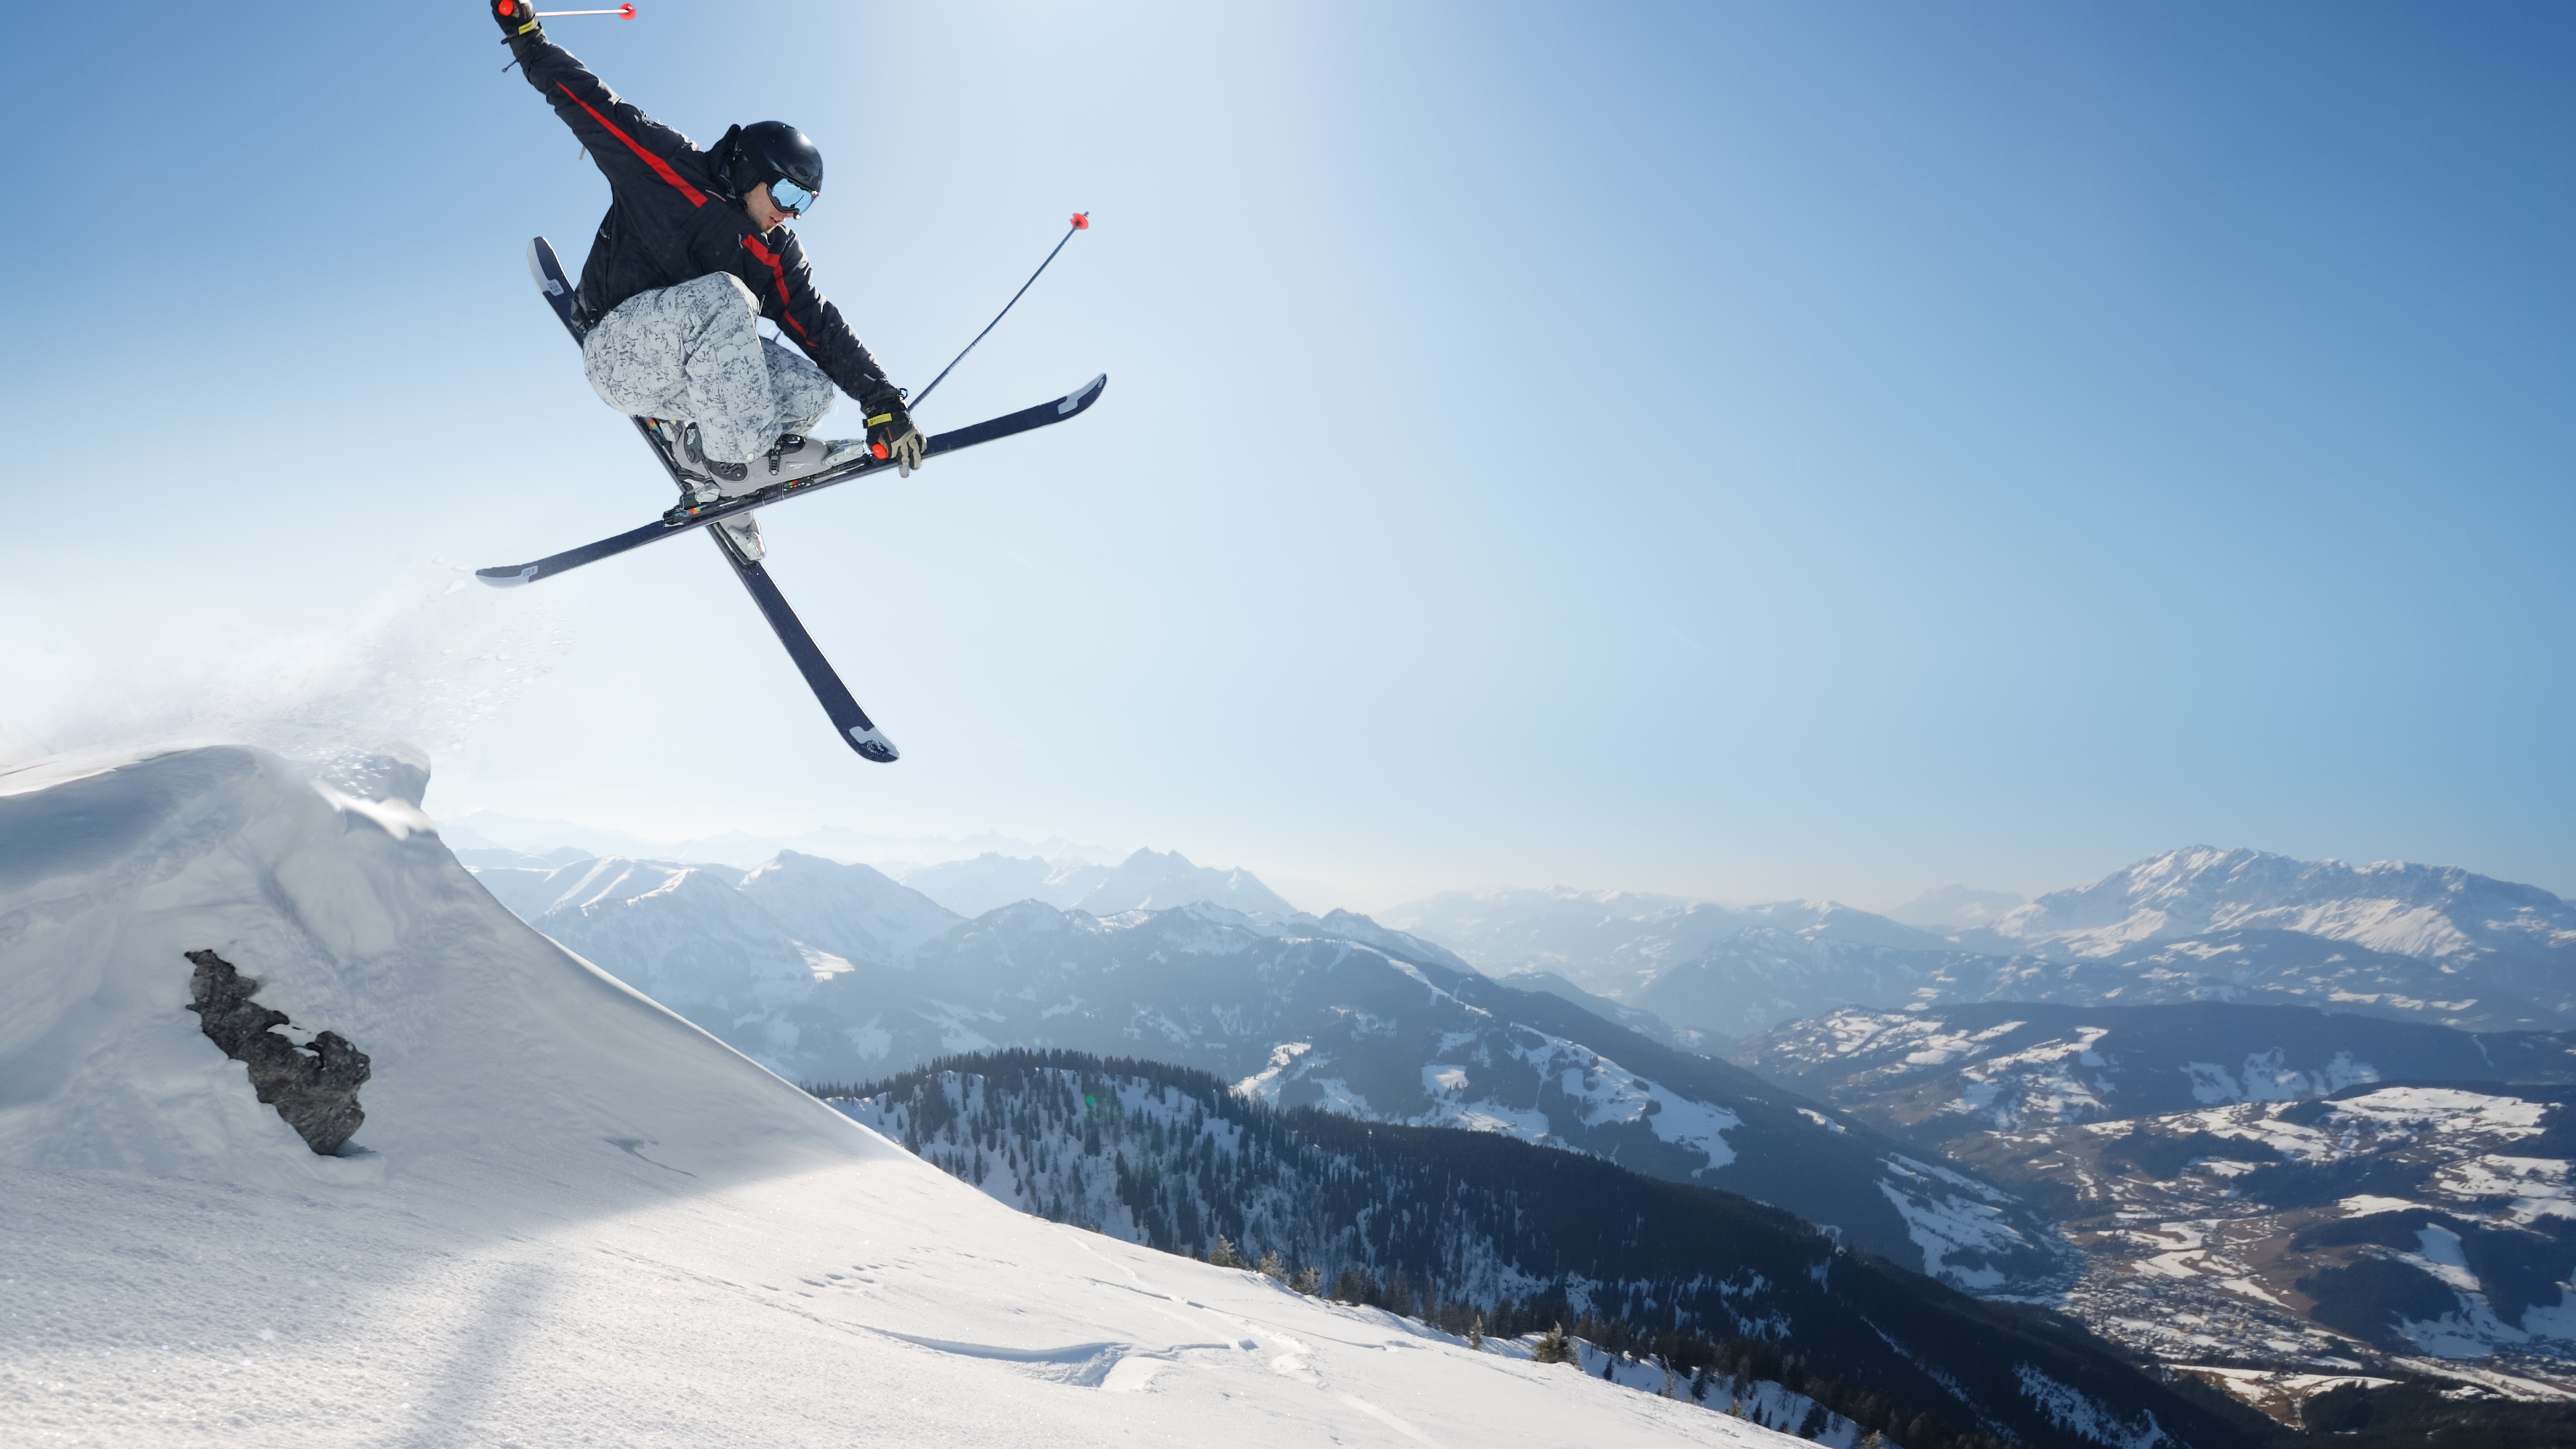 Skiing 4k Ultra HD Wallpaper